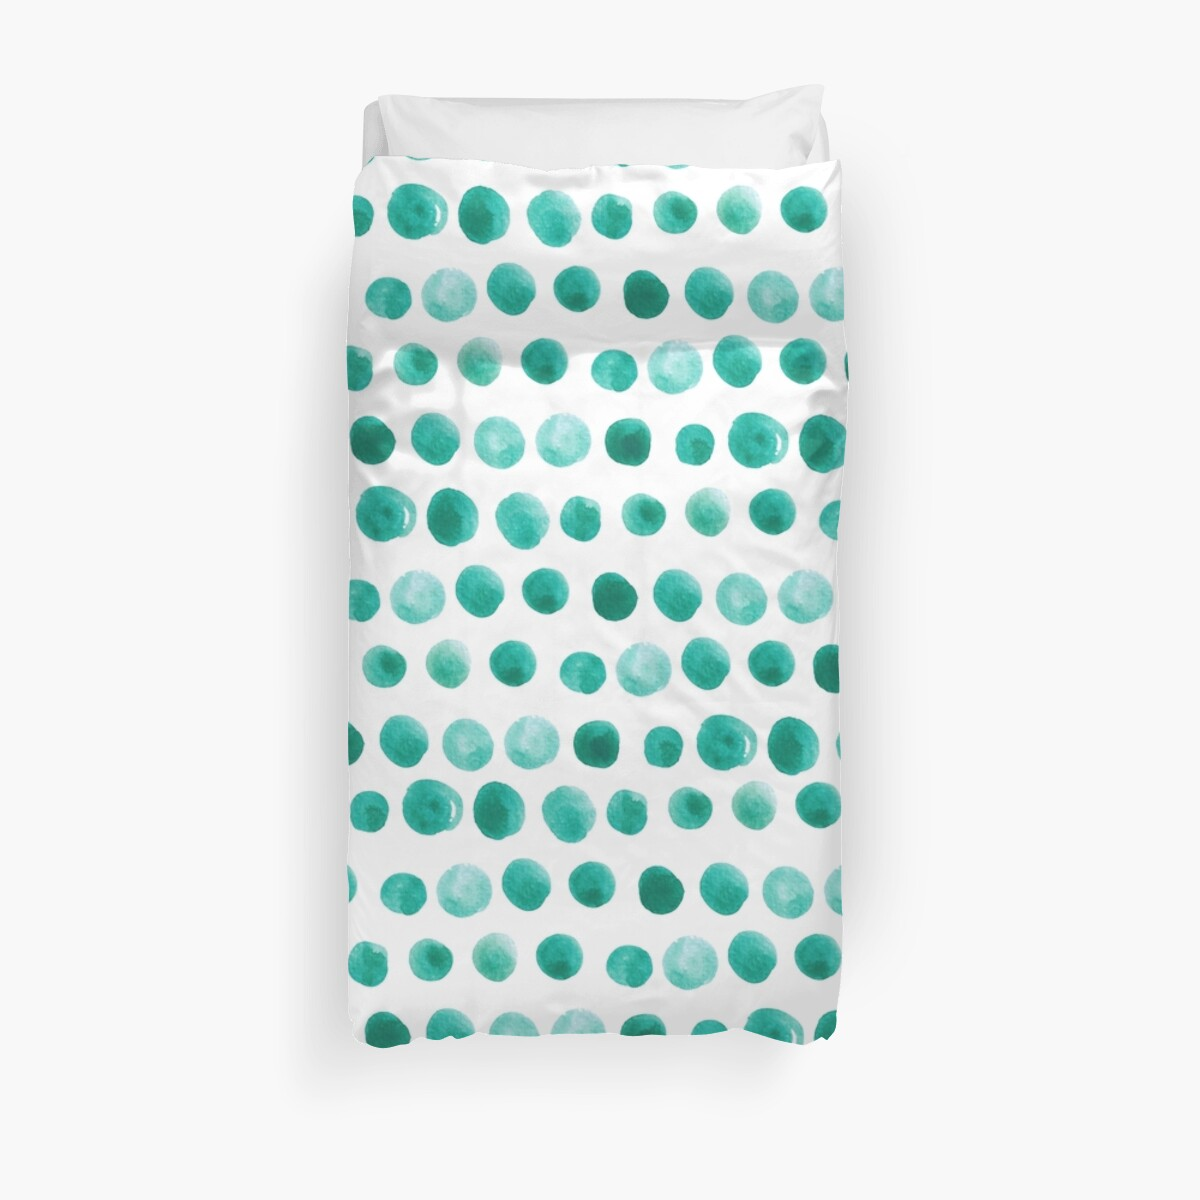 Watercolor green dots pattern by FuzzyLogicKate